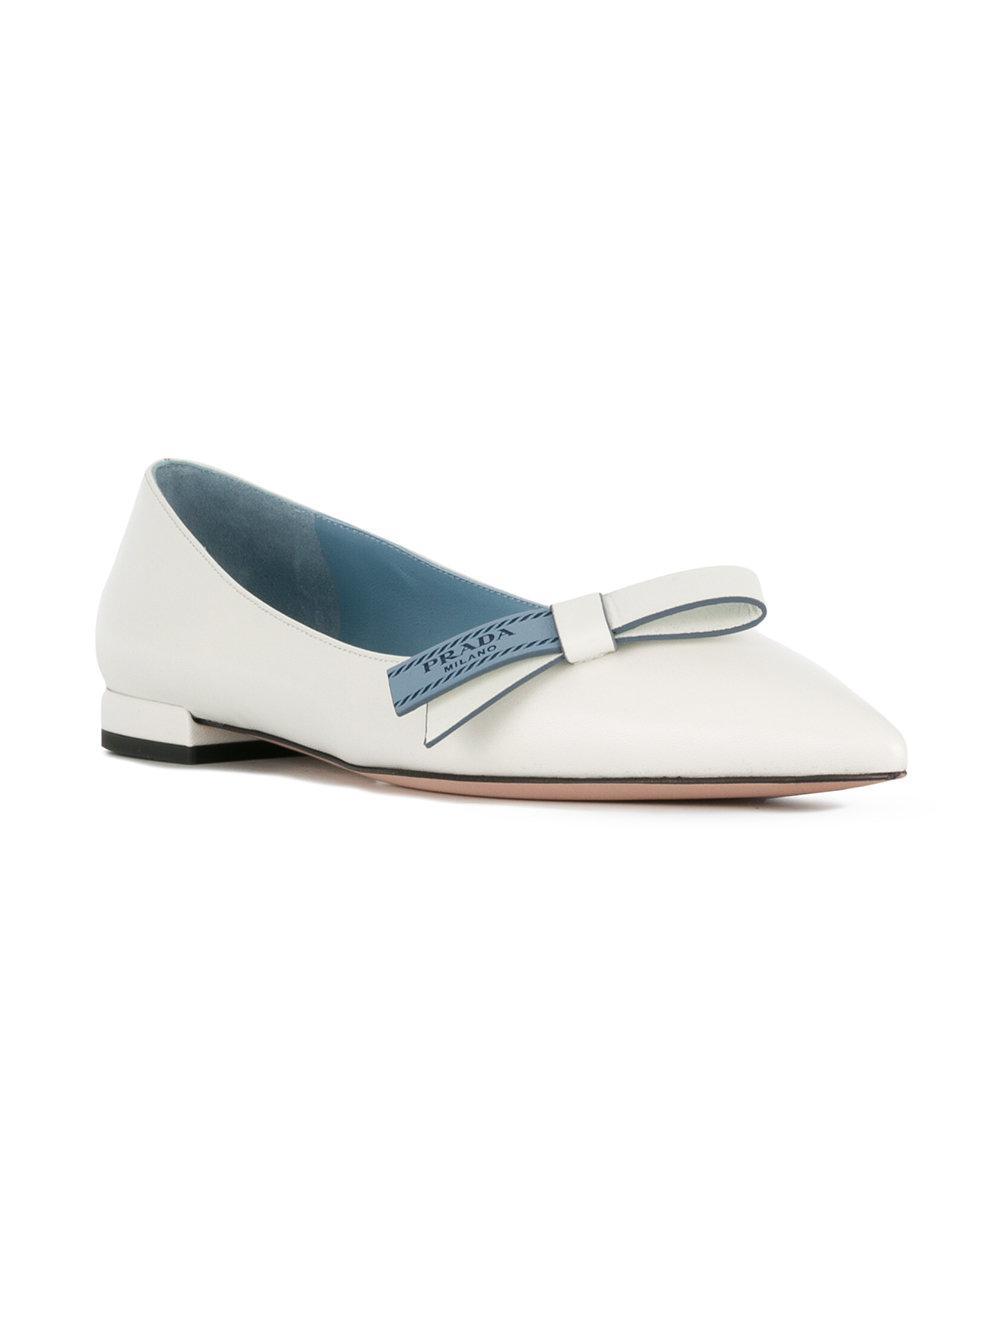 branded bow ballerina shoes - White Prada ZJxFOqd